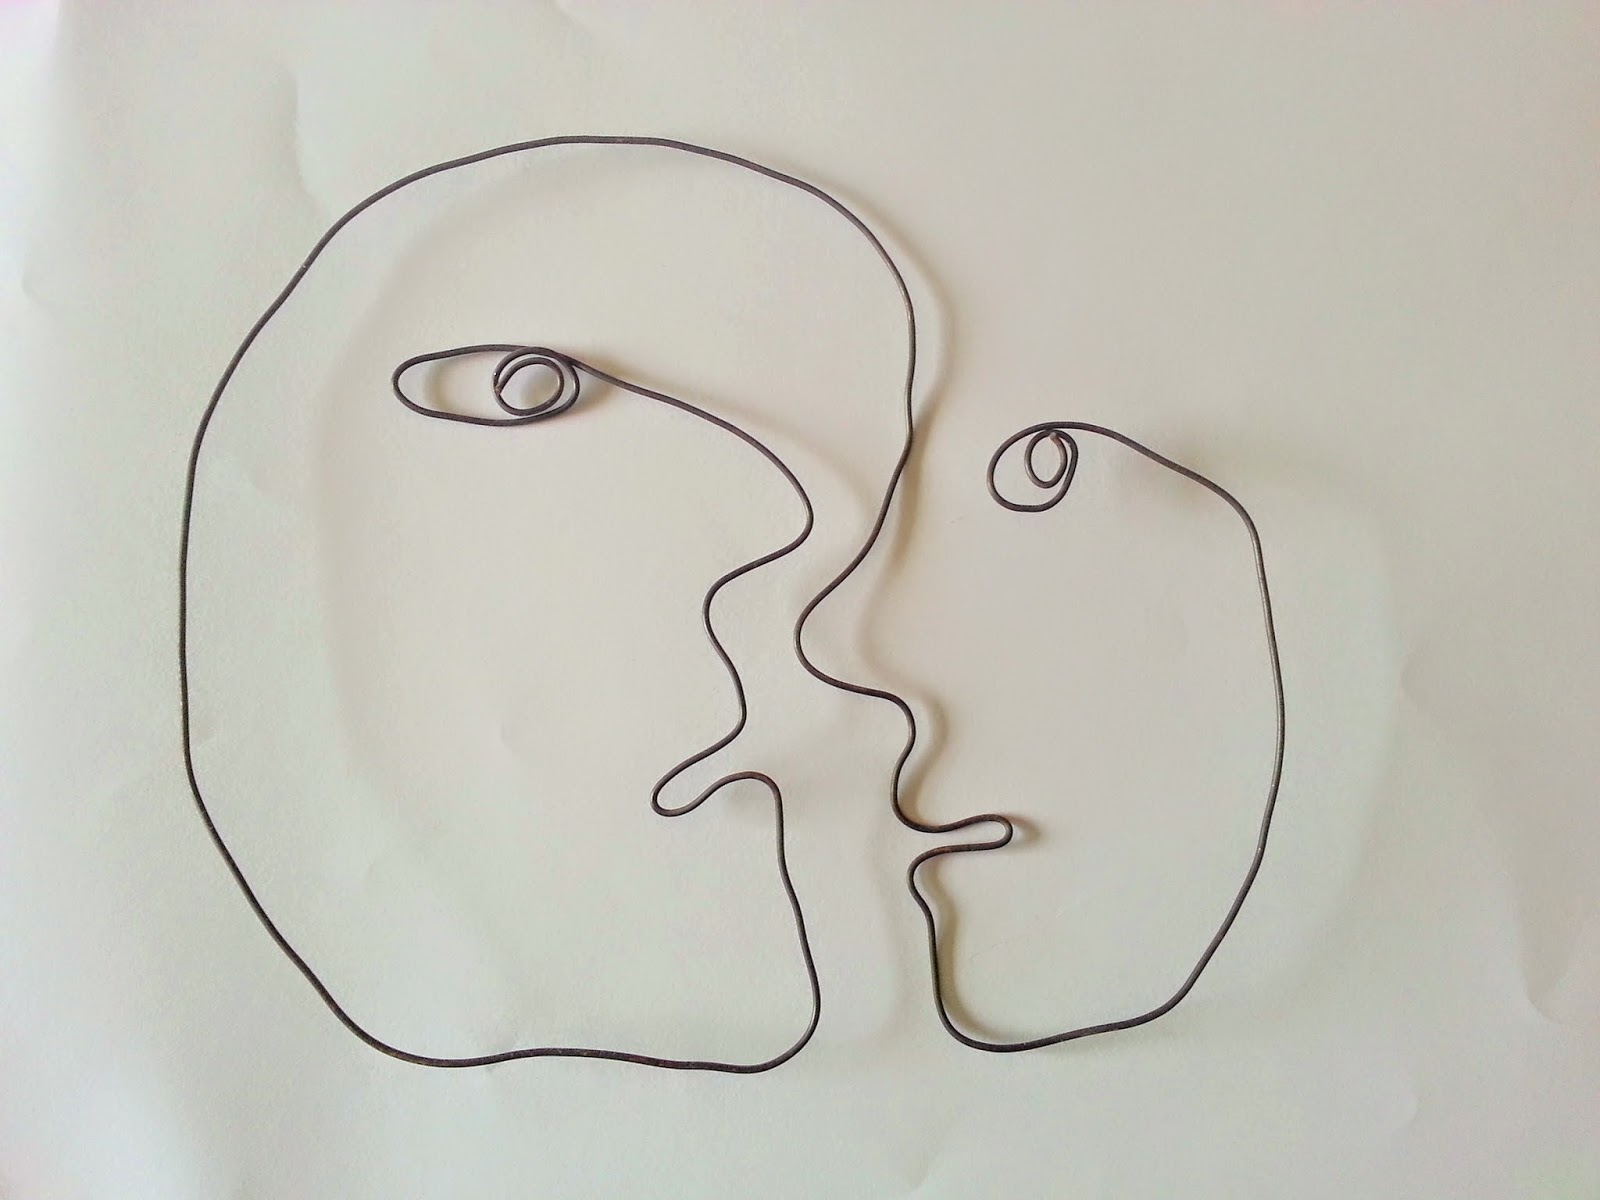 Matglad eriksson talade i rodgrona termer